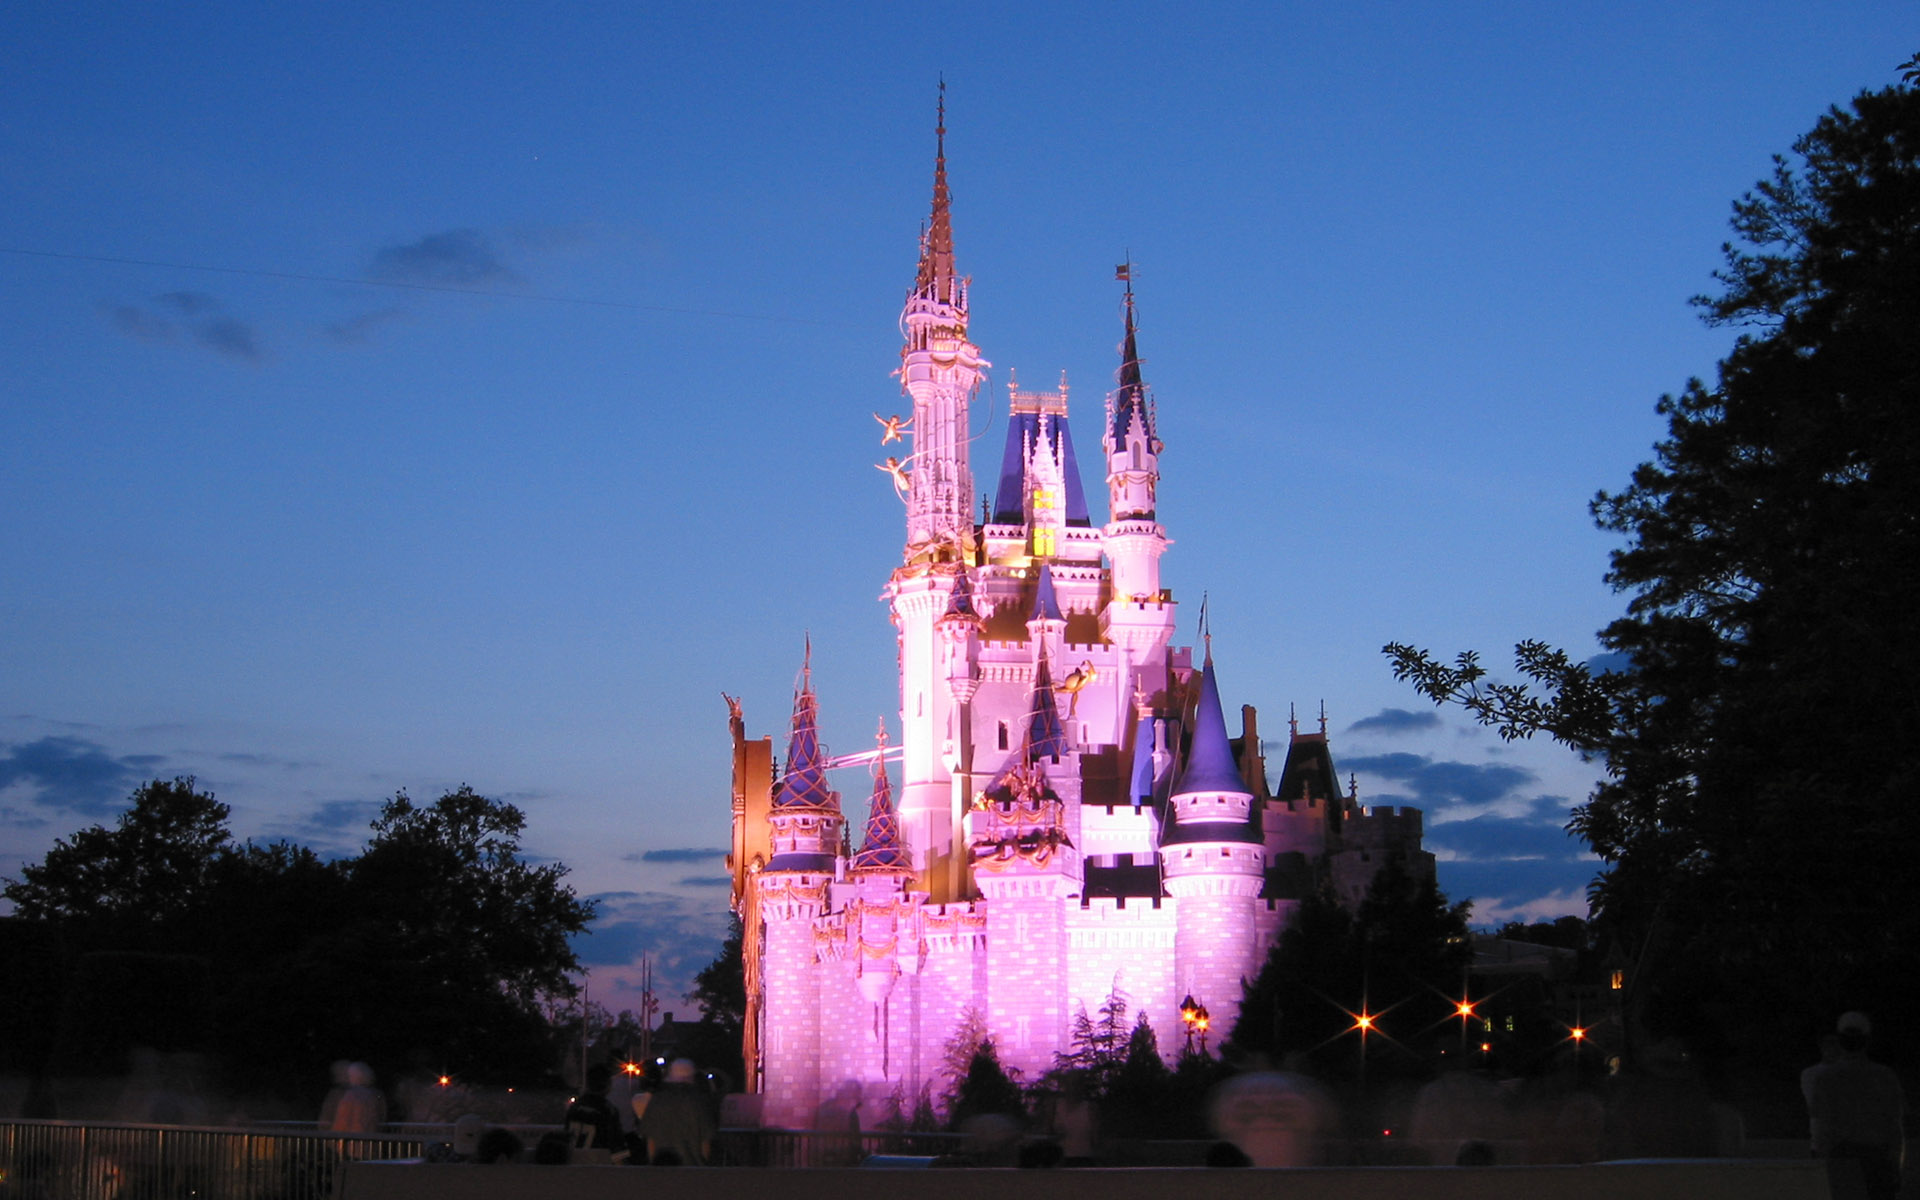 Disneyland Full HD Wallpaper and Background Image